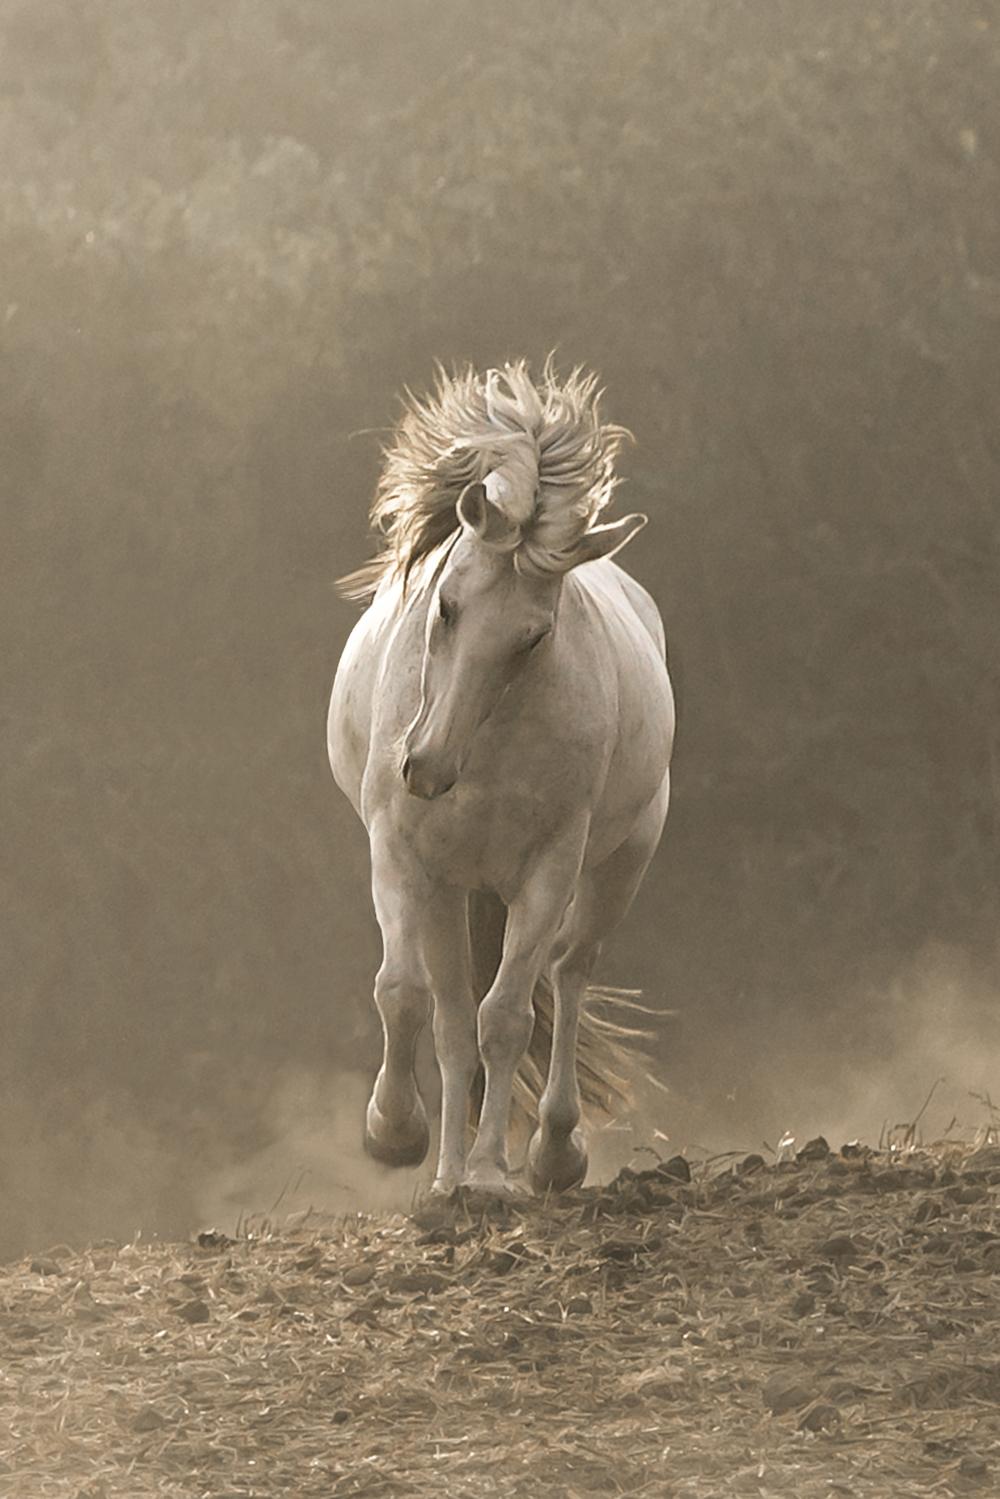 Grey mare on the run